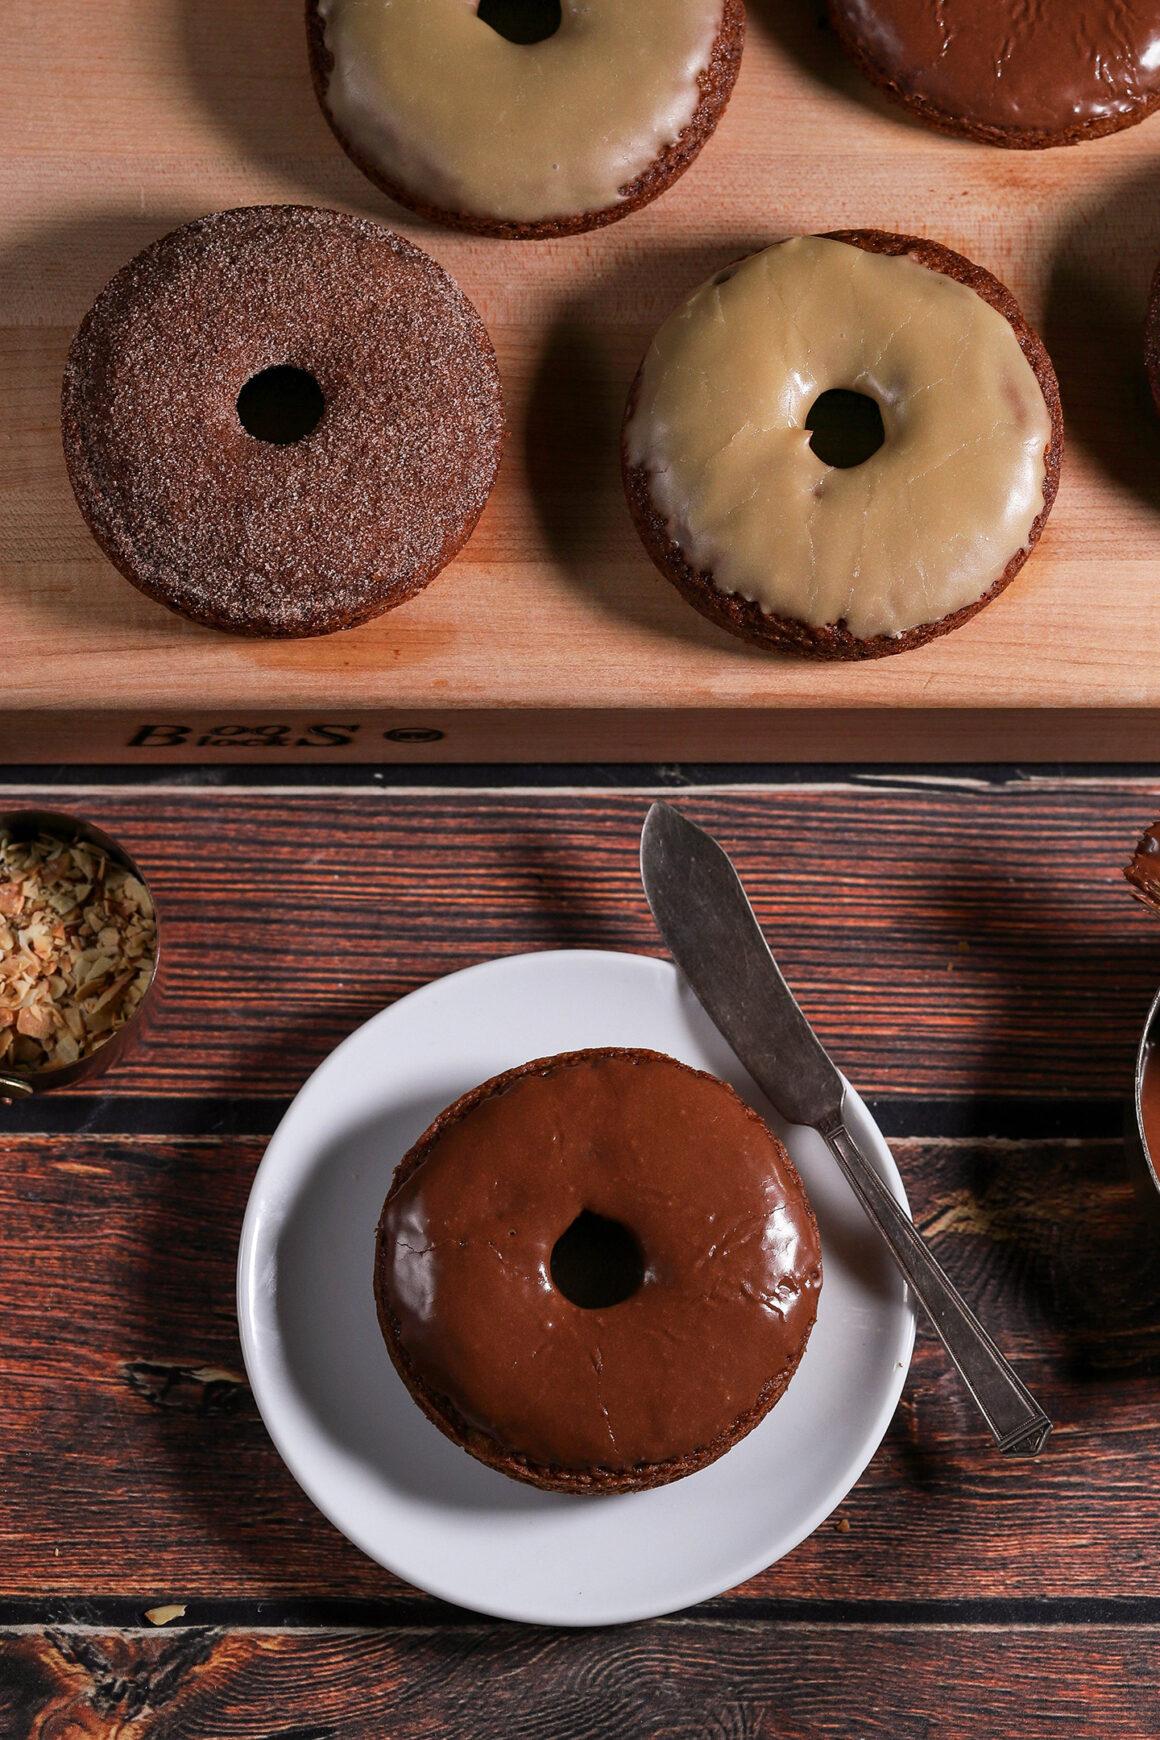 Chocolate Glazed Pear Doughnut